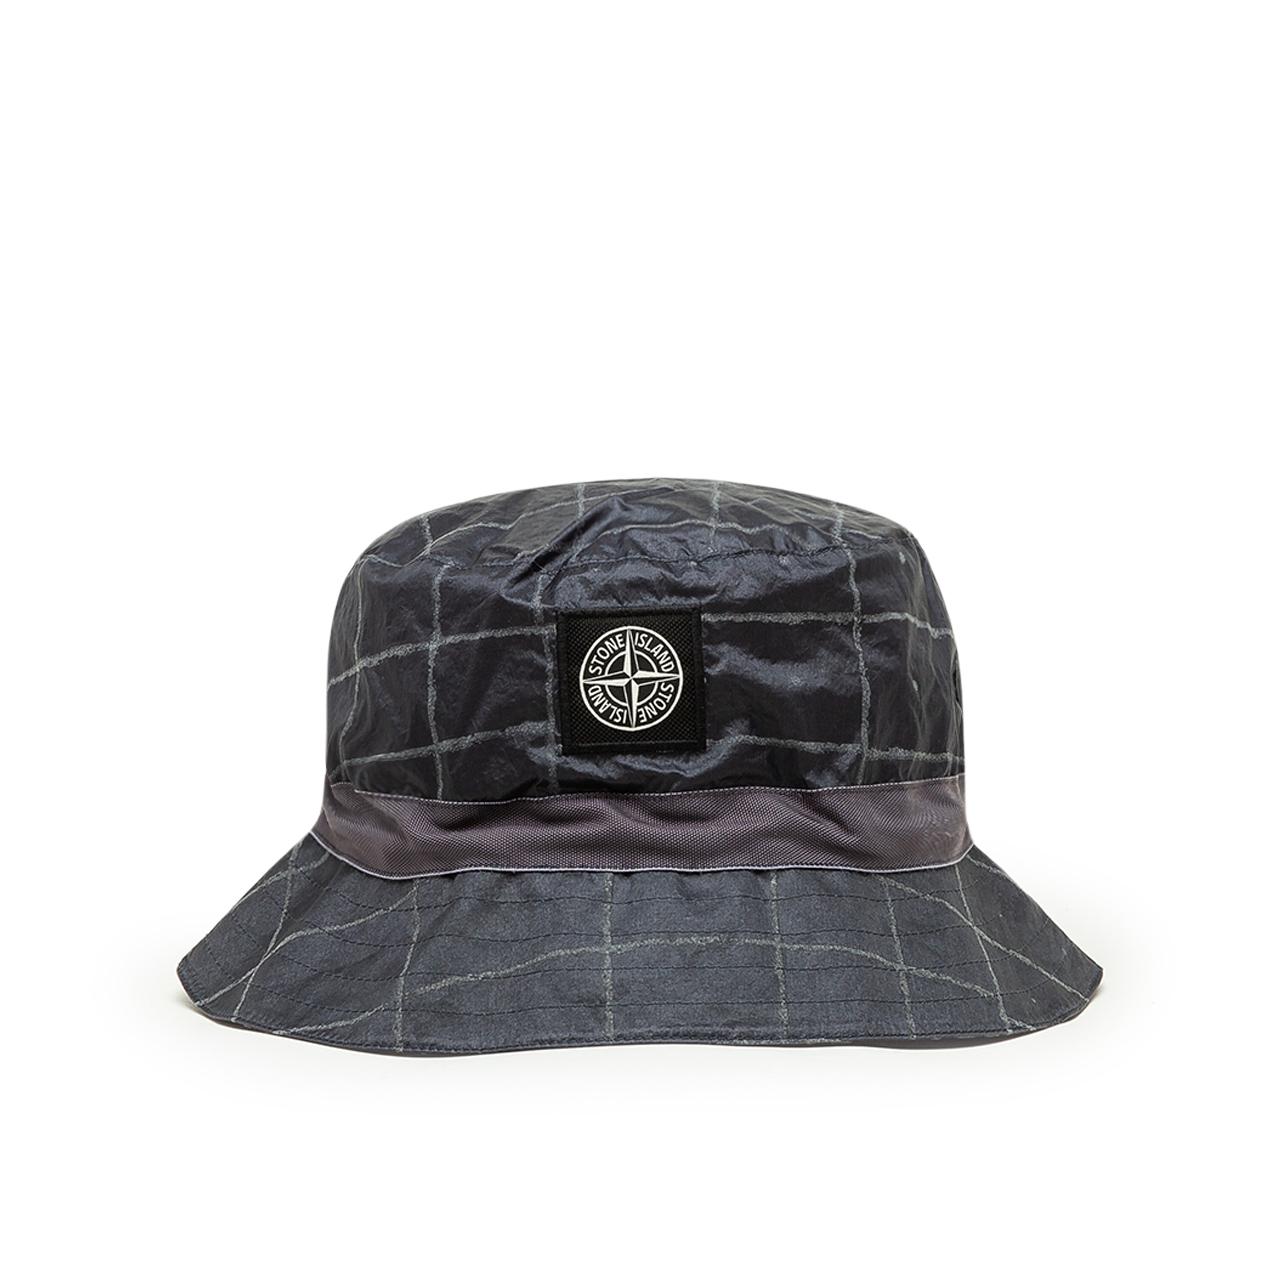 Stone Island Reflective Grid Bucket Hat (Schawrz)